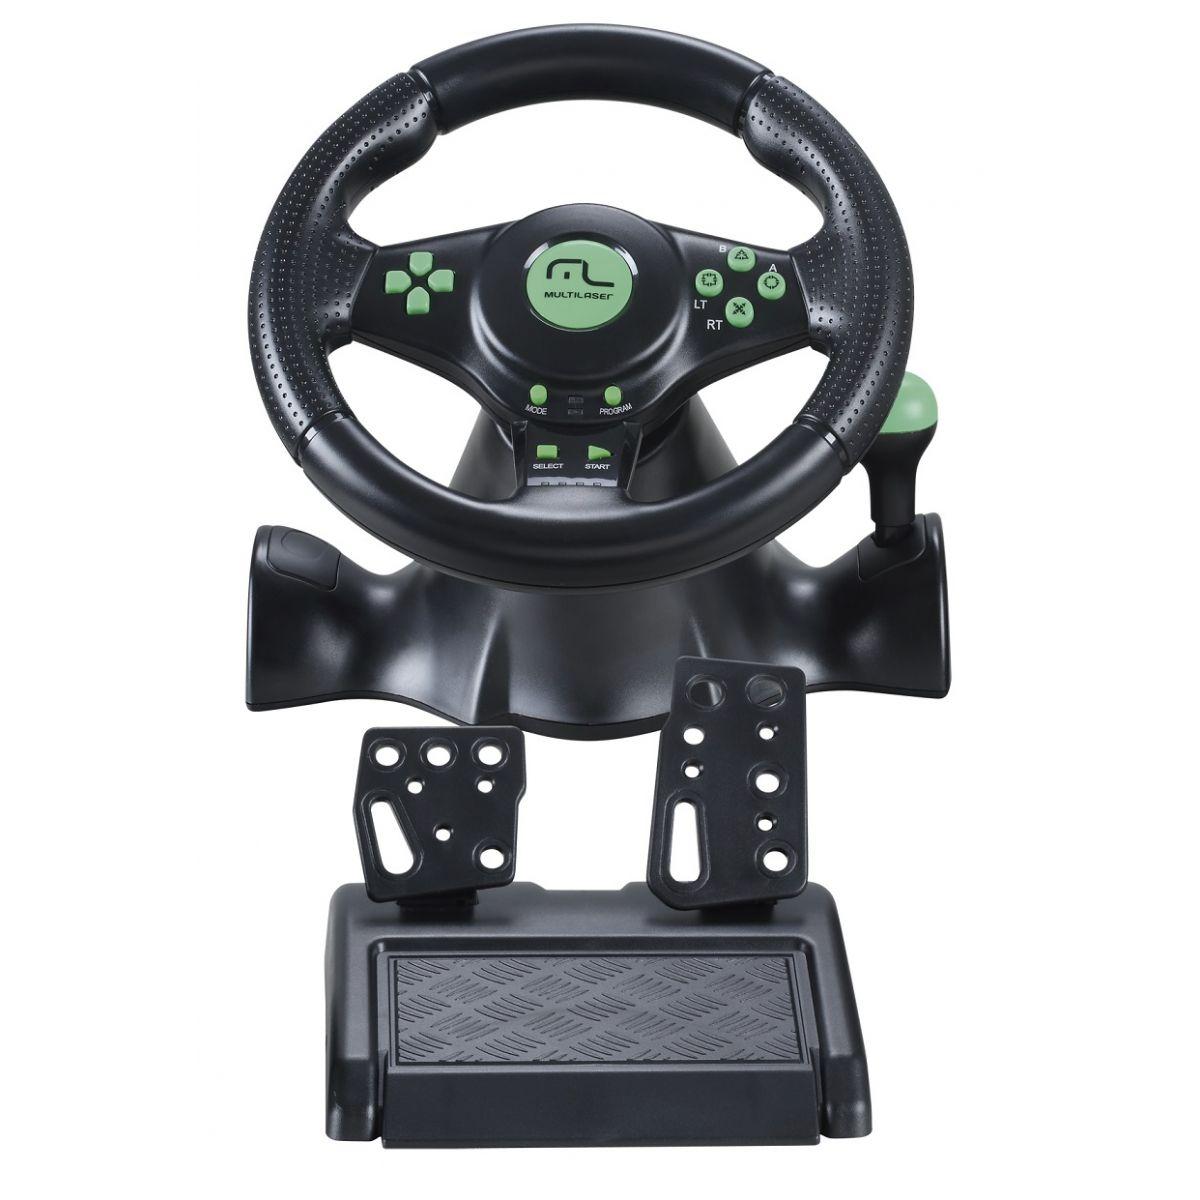 Volante Racer 4 em 1 Xbox360 / PS3 / PS2 / PC com Marcha Acoplada JS075 - Multilaser